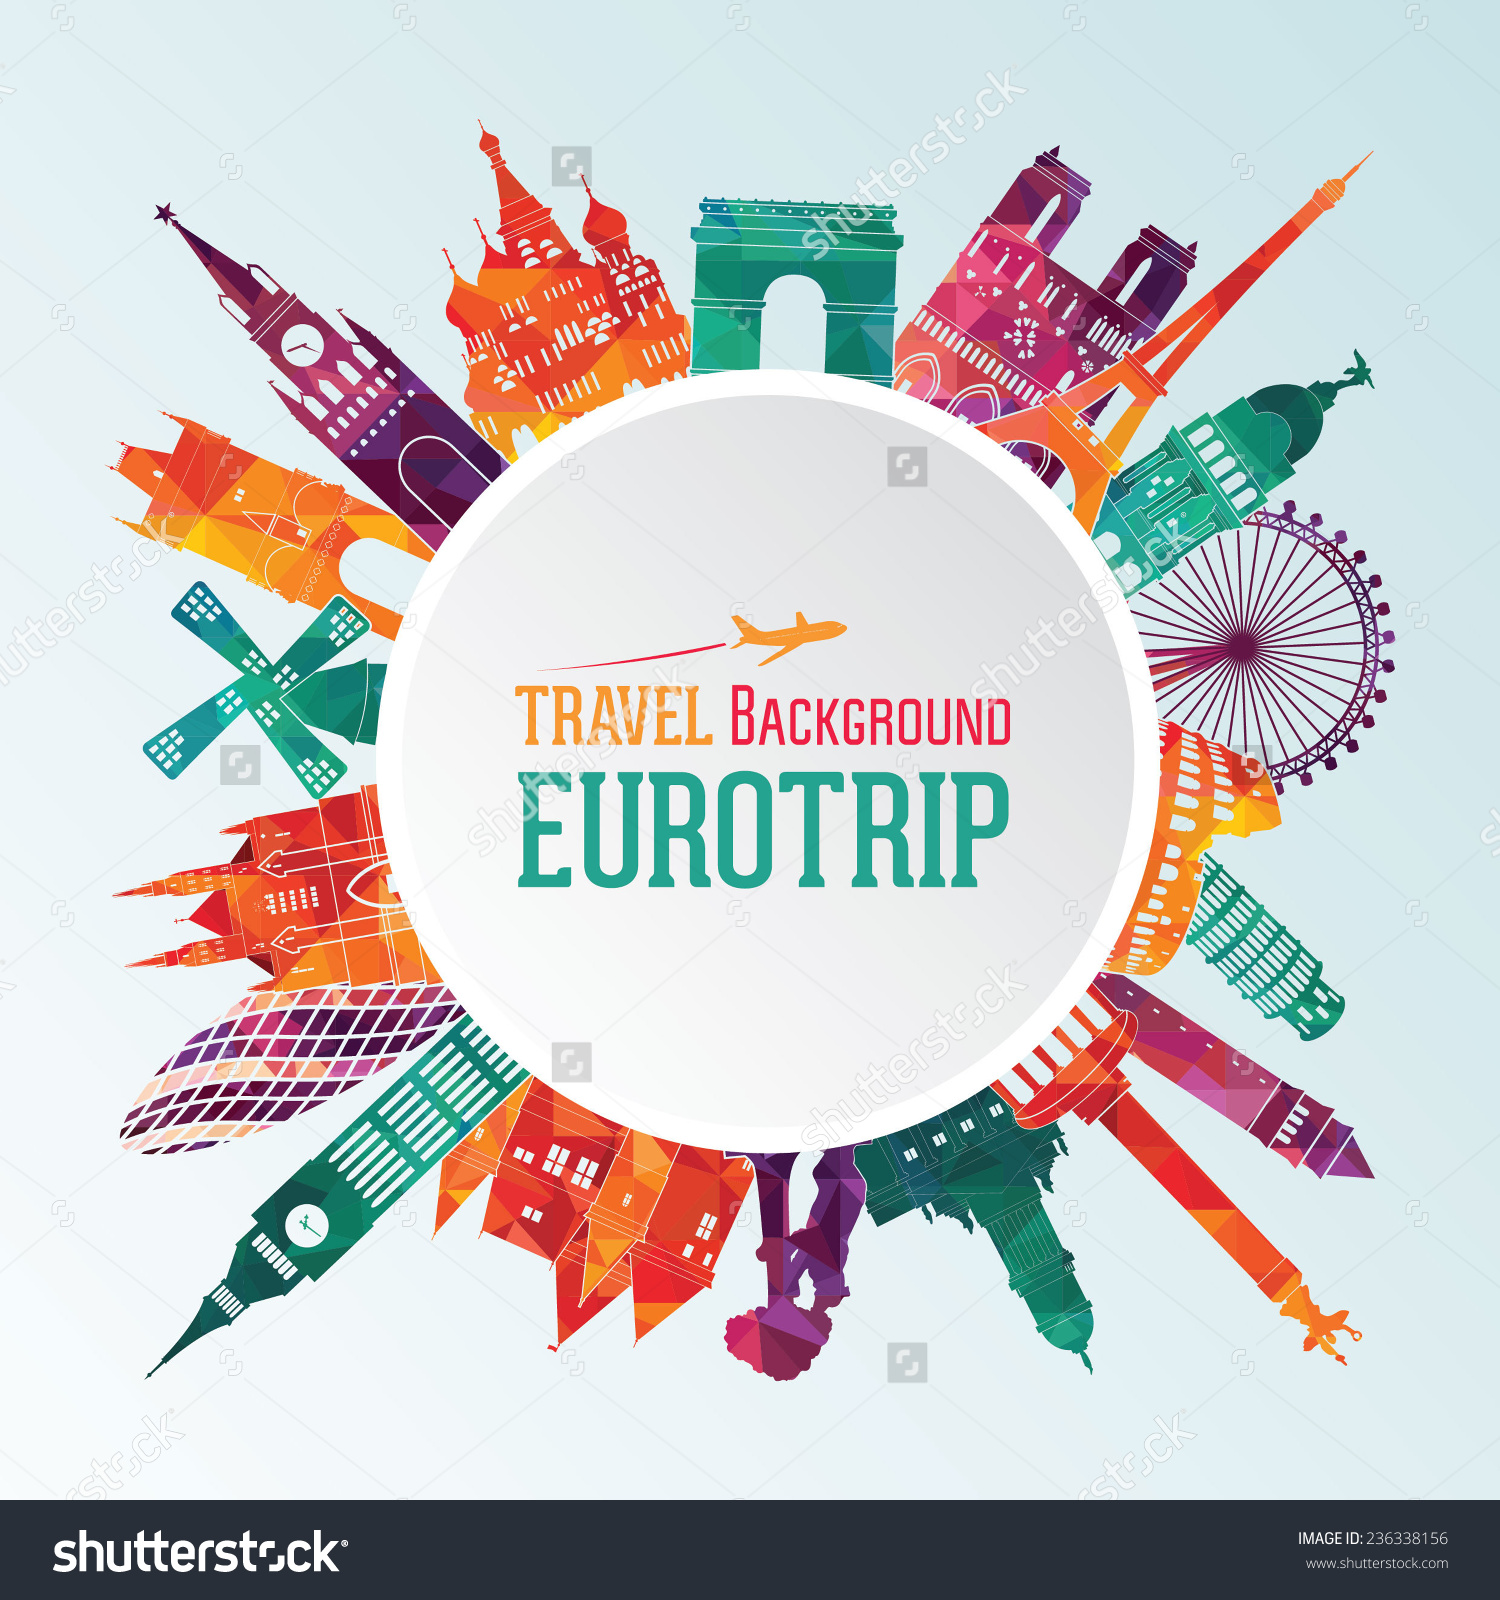 Easy Ways To Travel Europe